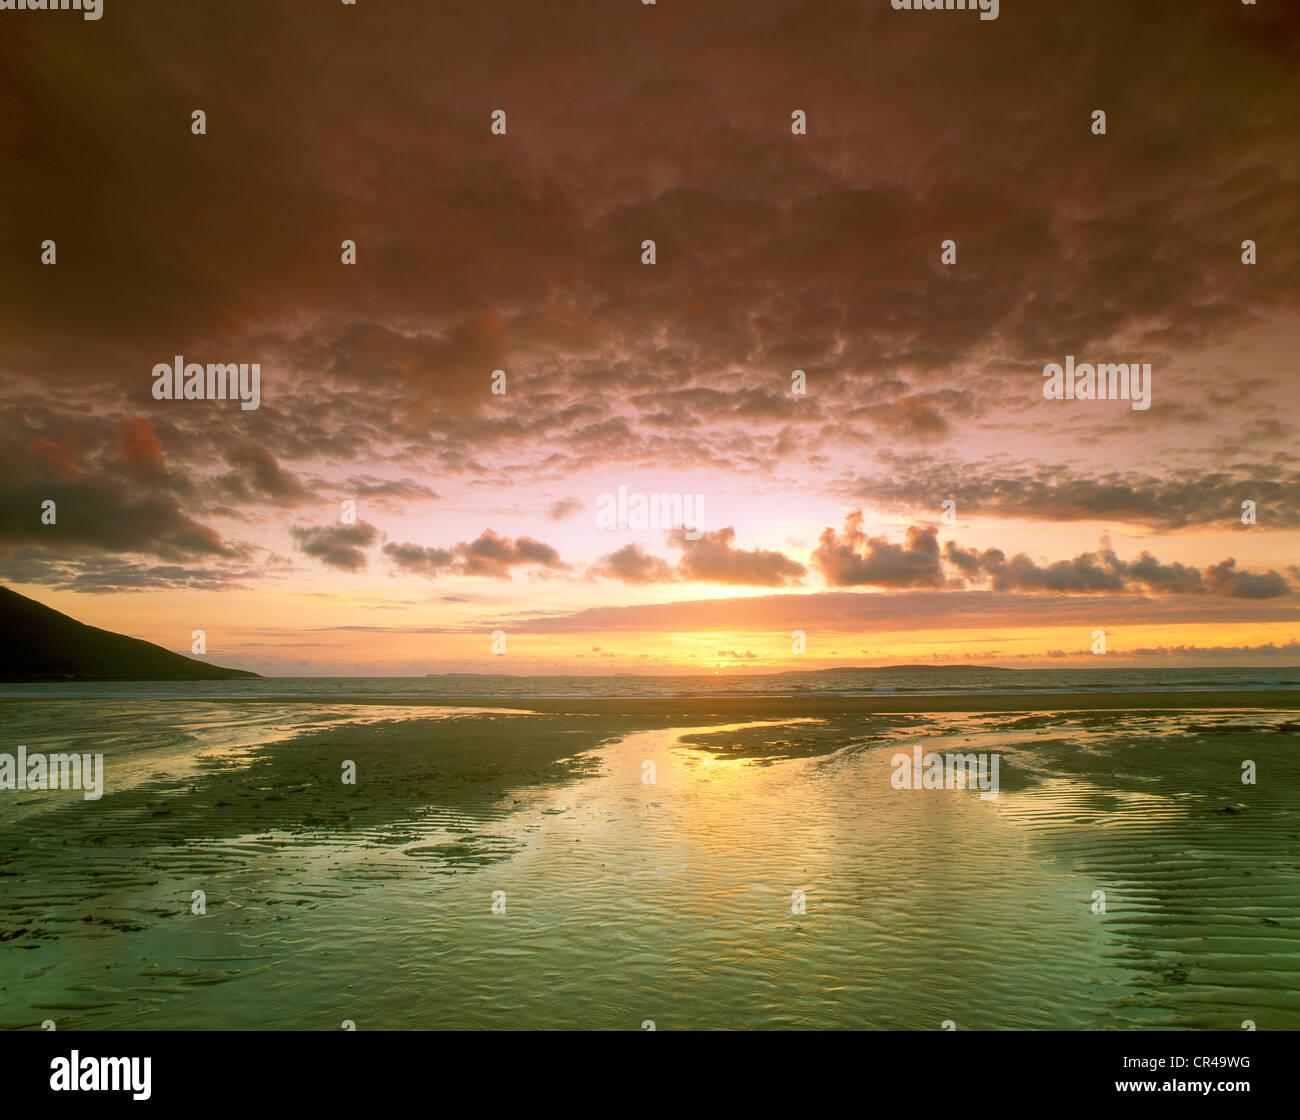 Sunset on the beach, Achill Island, County Mayo, Republic of Ireland, Europe - Stock Image